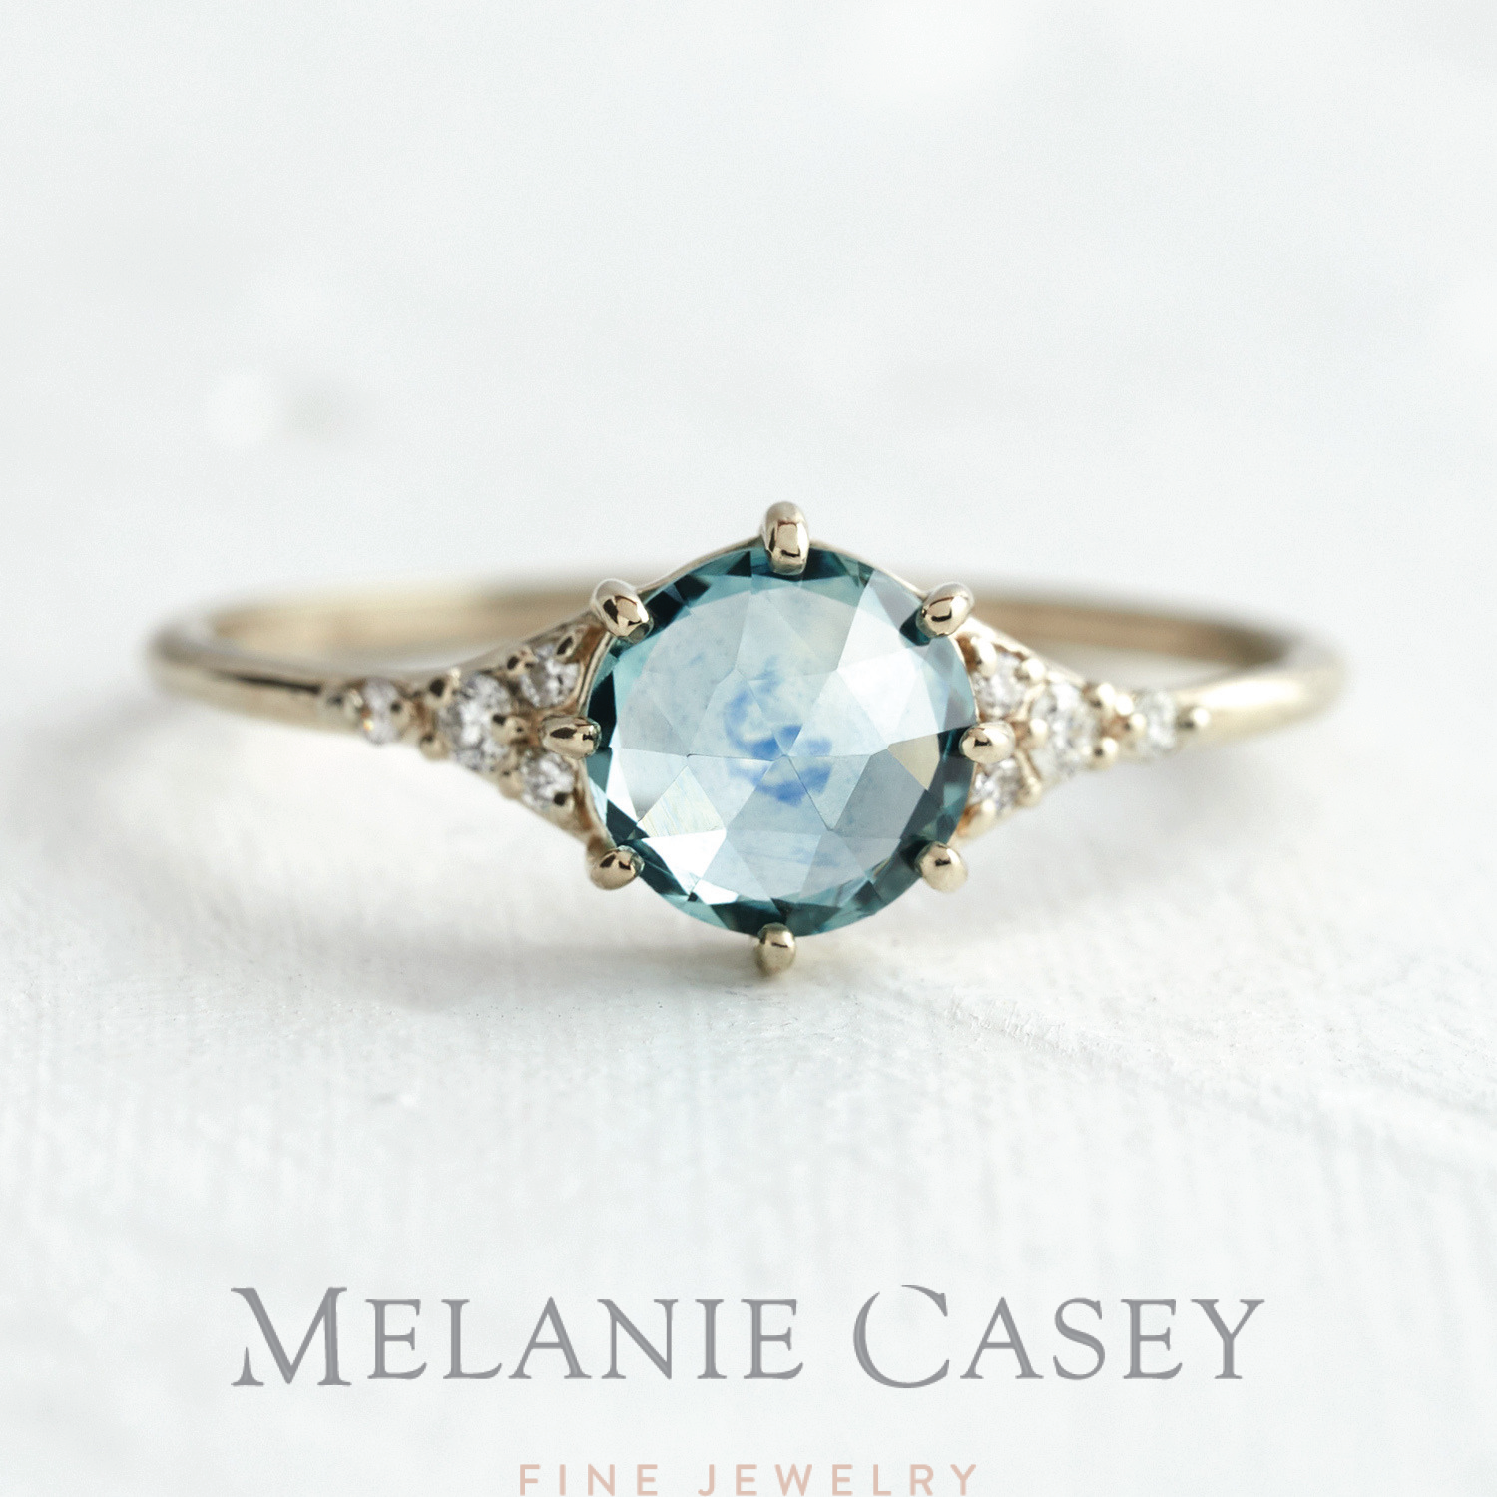 Pin On Melanie Casey Jewelry Designs